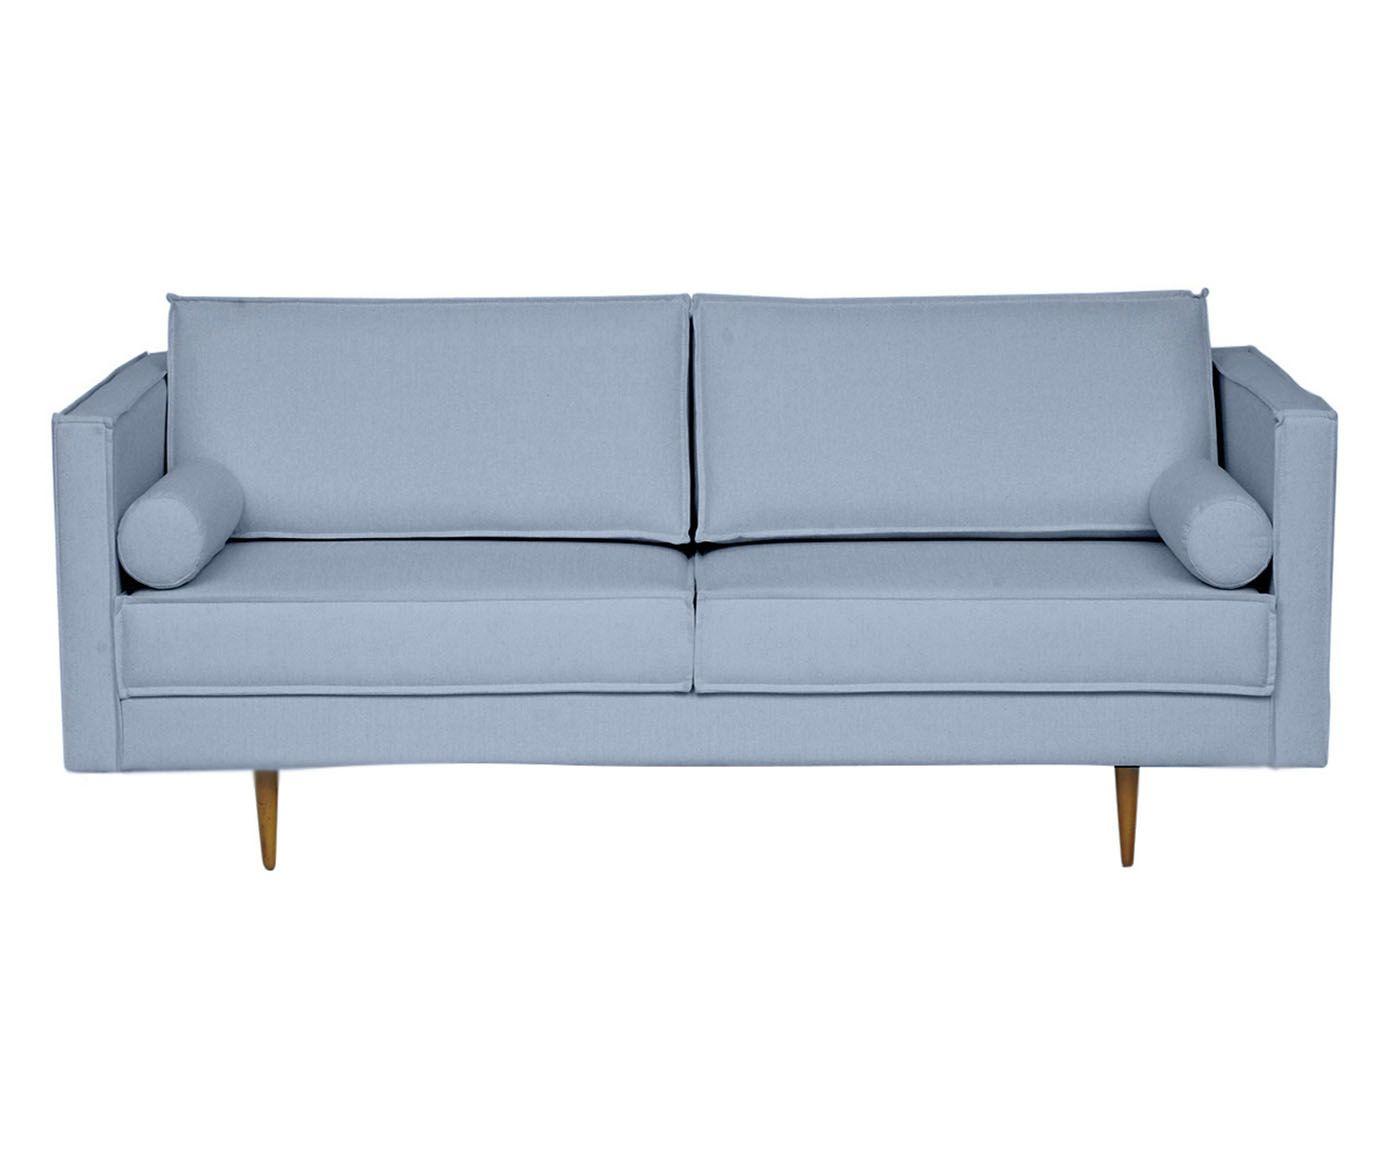 Sofá Audrey Azul Nuvem - 180X85X90cm | Westwing.com.br